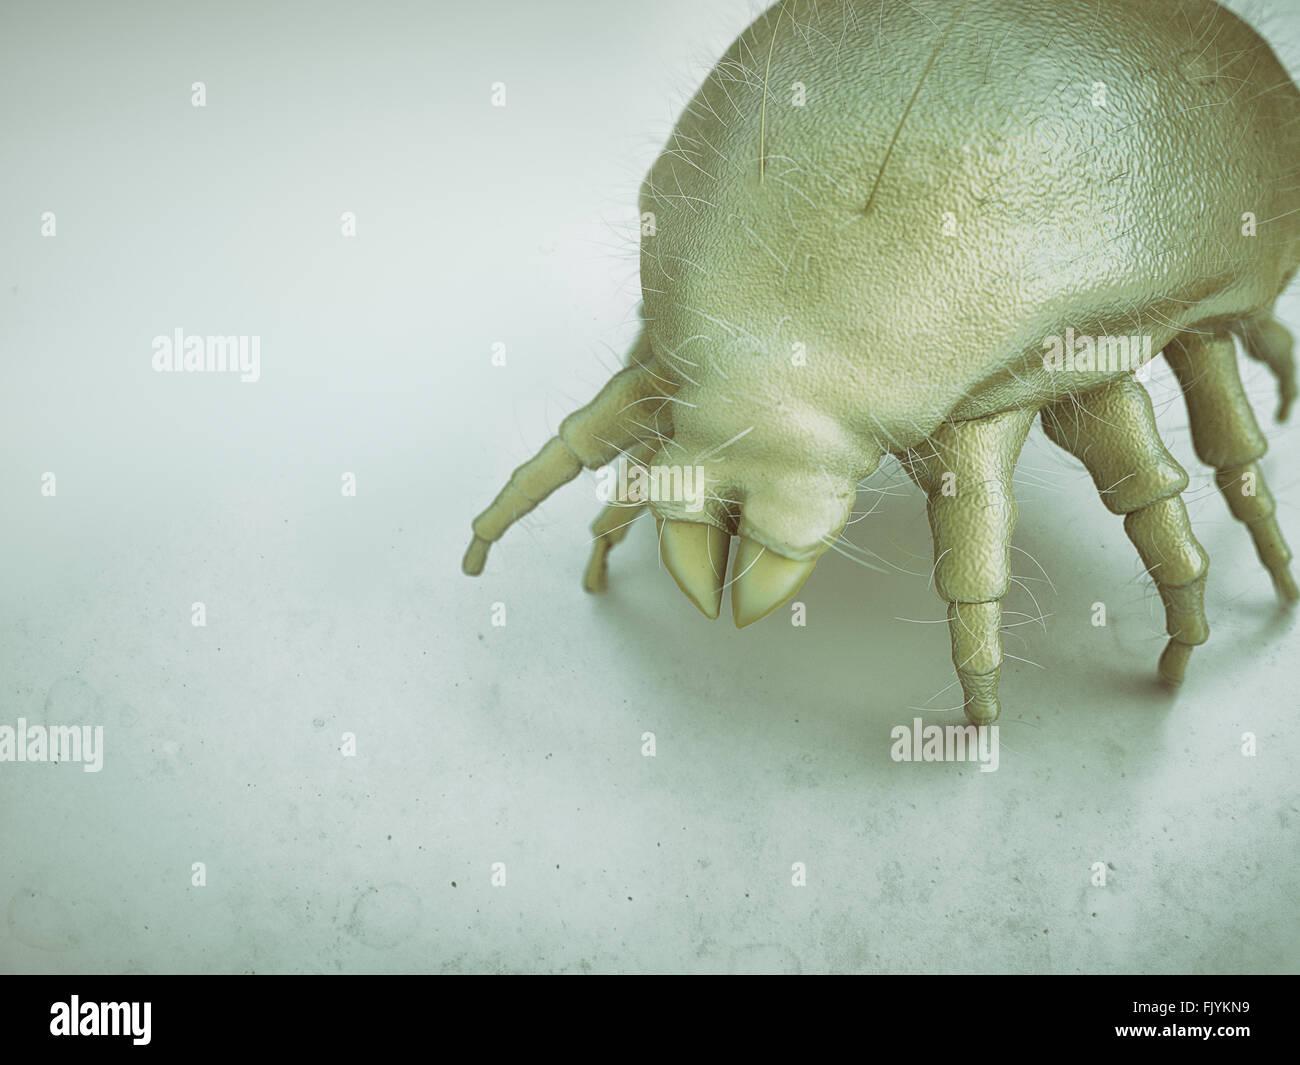 House dust mite Stock Photo